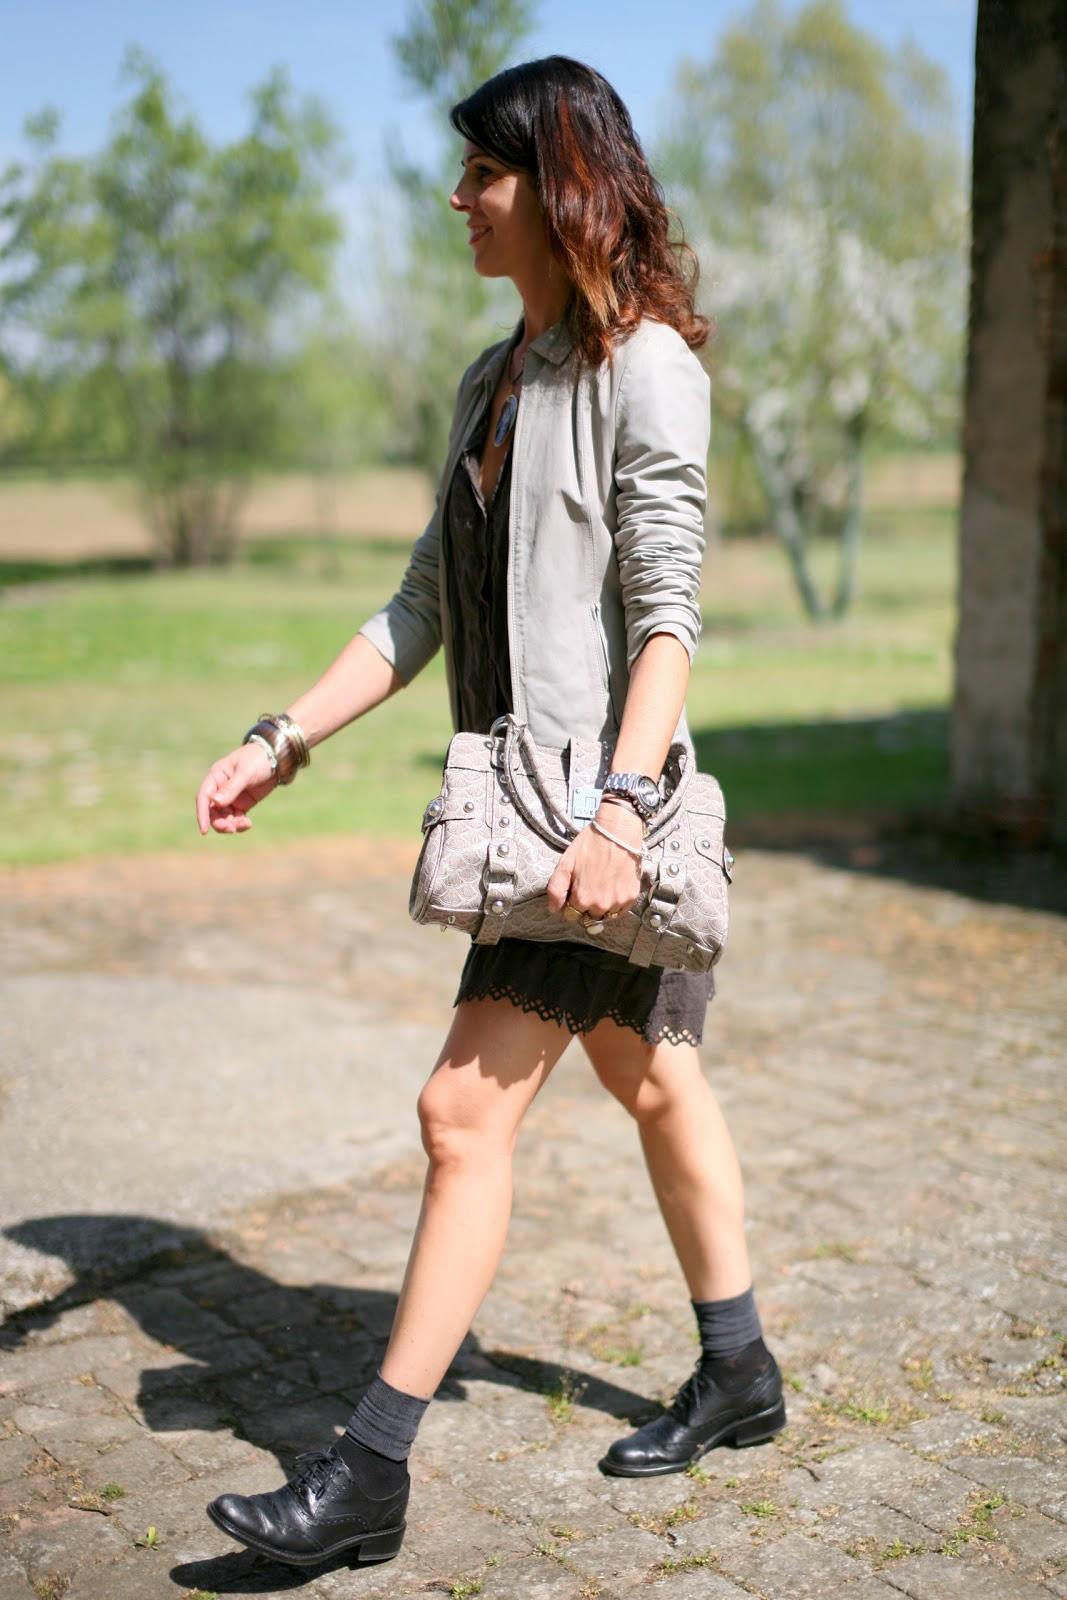 Oxford Shoes 2011 Trend Fashion Allure